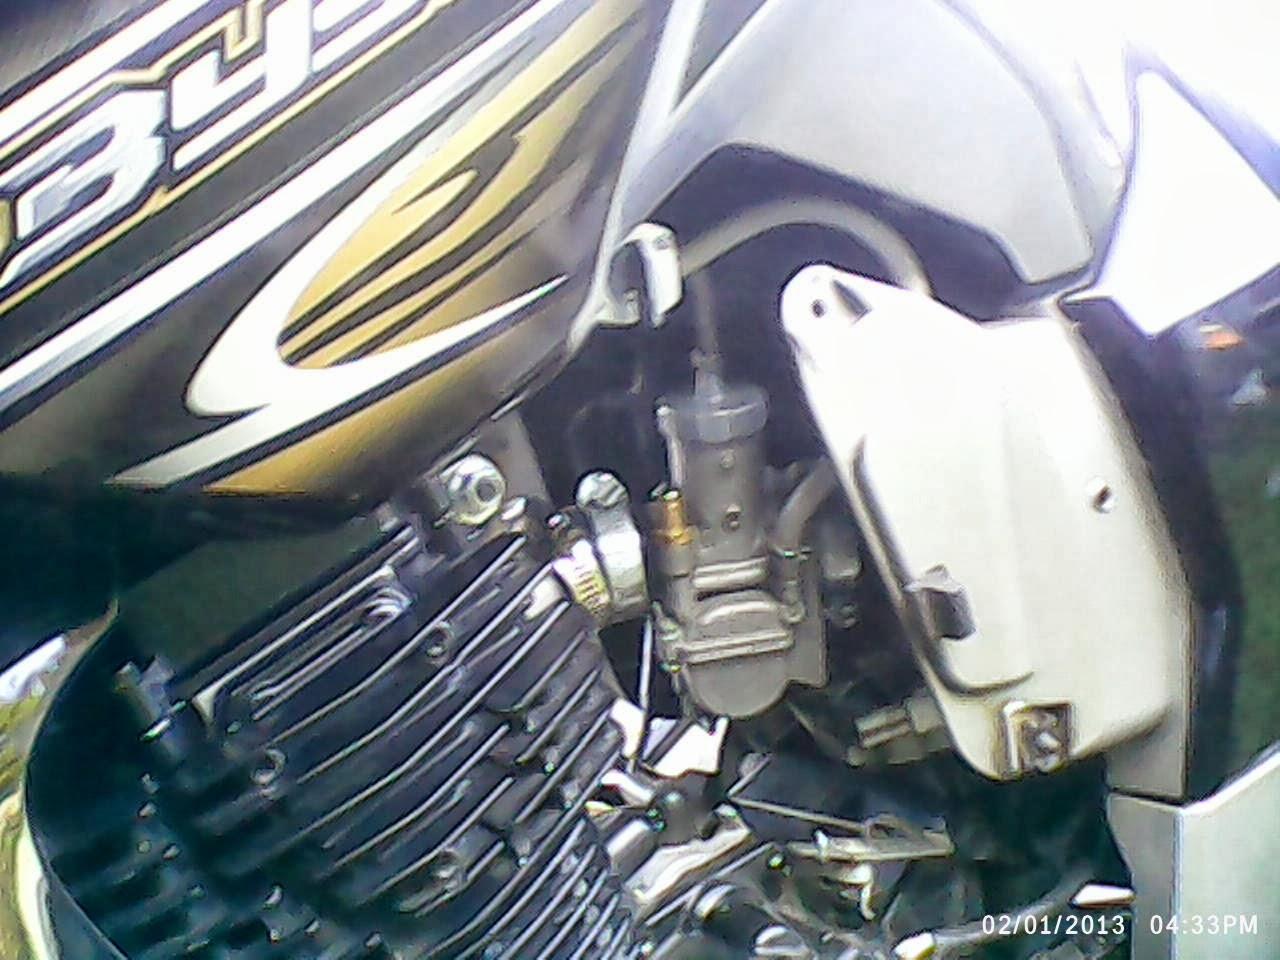 Jongki Byson Mengganti Karburator Yamaha 1 Karbu Pe 24 26 28 Kehin Dari Orinya Ke Kabel Songket Tapi Cuma Gua Cklekk Doank Terus Chuck Gak Pasang Soalnya Malah Susah Hidup Mesinnya Shg Subal Pake